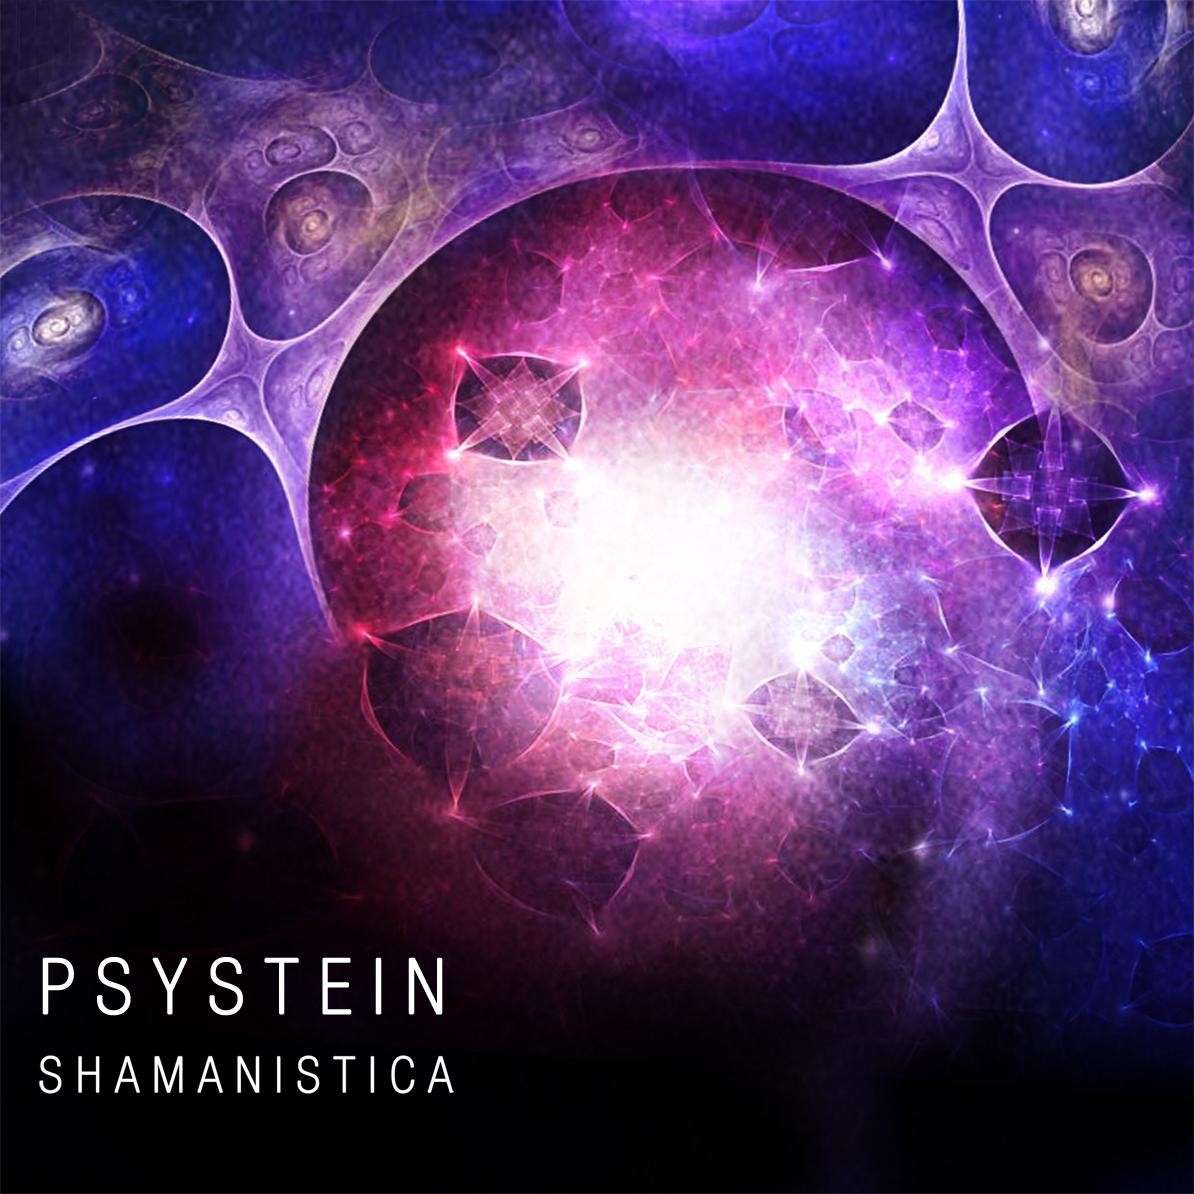 Shamanistica